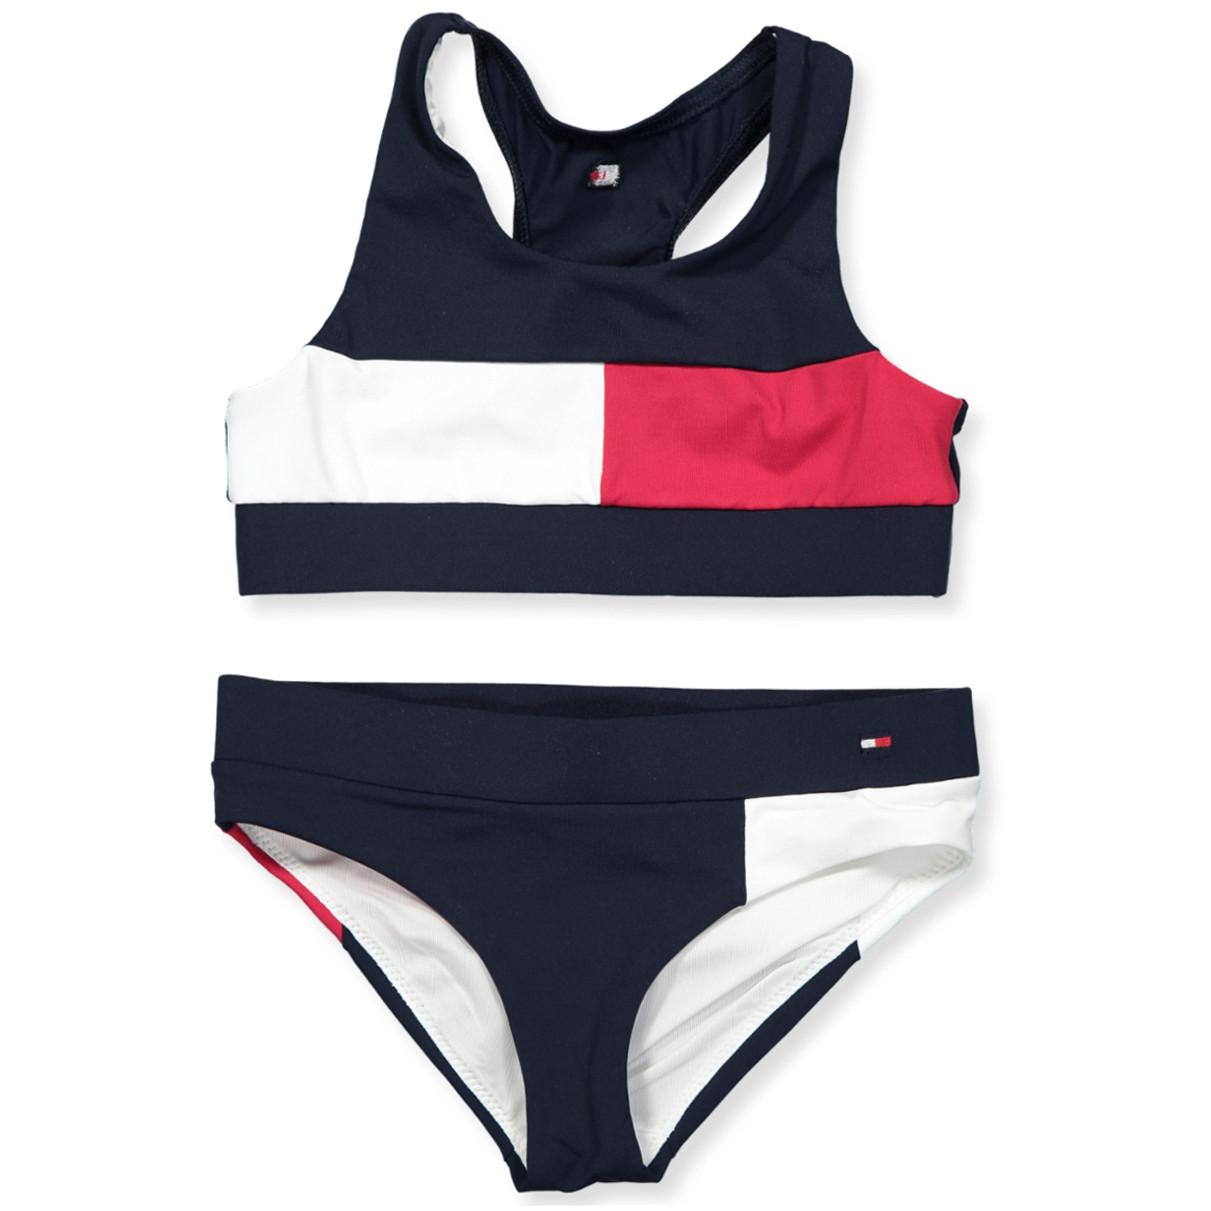 tommy hilfiger navy bikini navy blazer navy. Black Bedroom Furniture Sets. Home Design Ideas